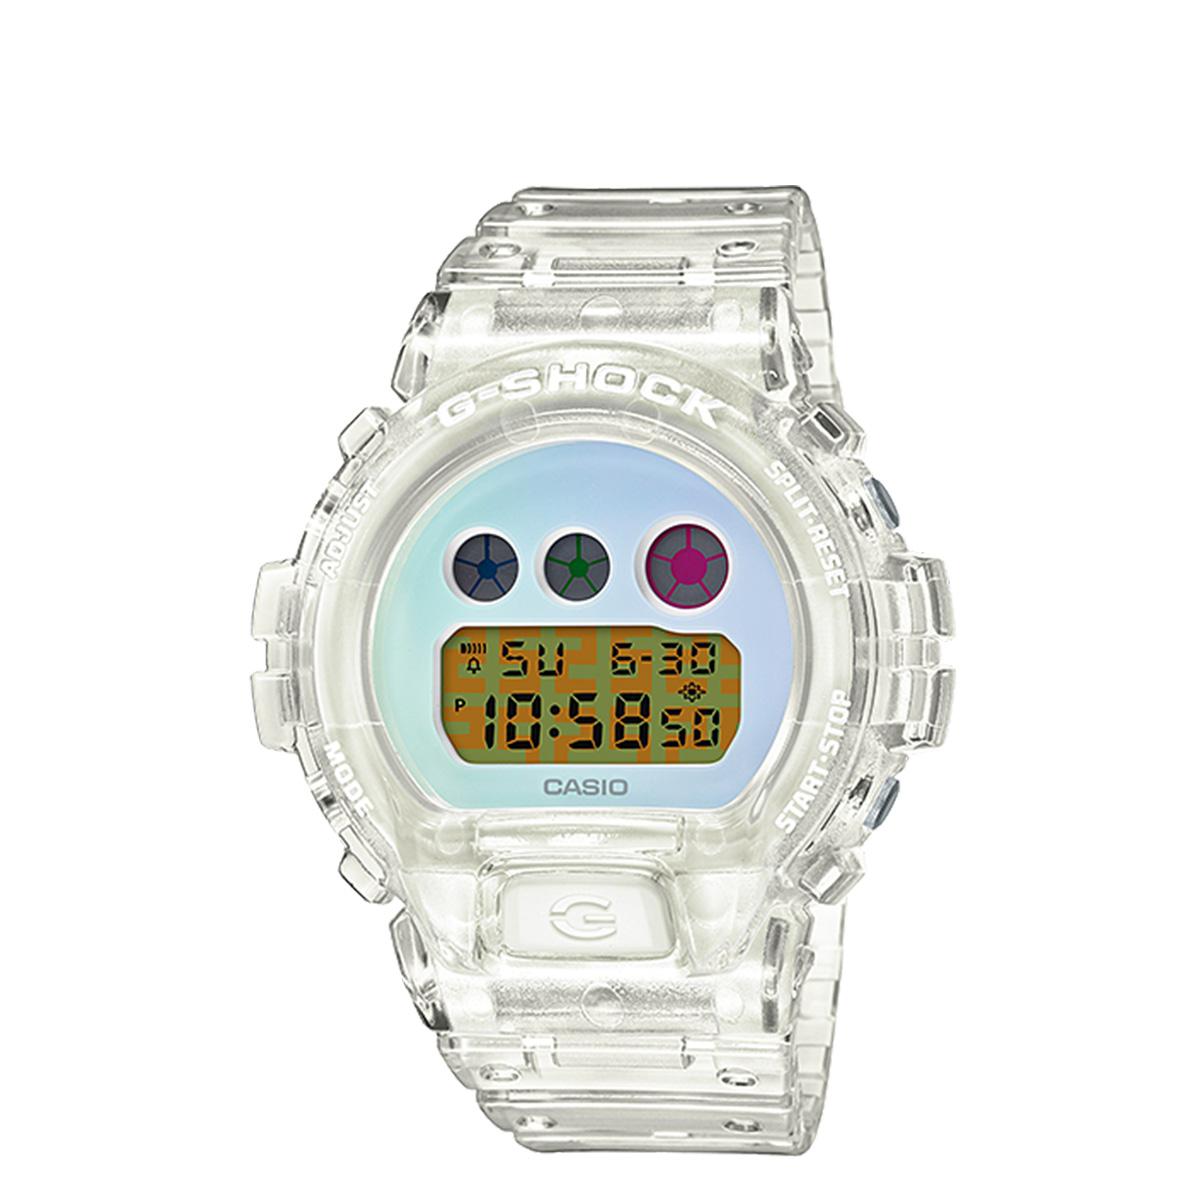 CASIO G-SHOCK カシオ 腕時計 DW-6900SP-7JR 25周年記念 メンズ レディース クリア [3/19 新入荷]